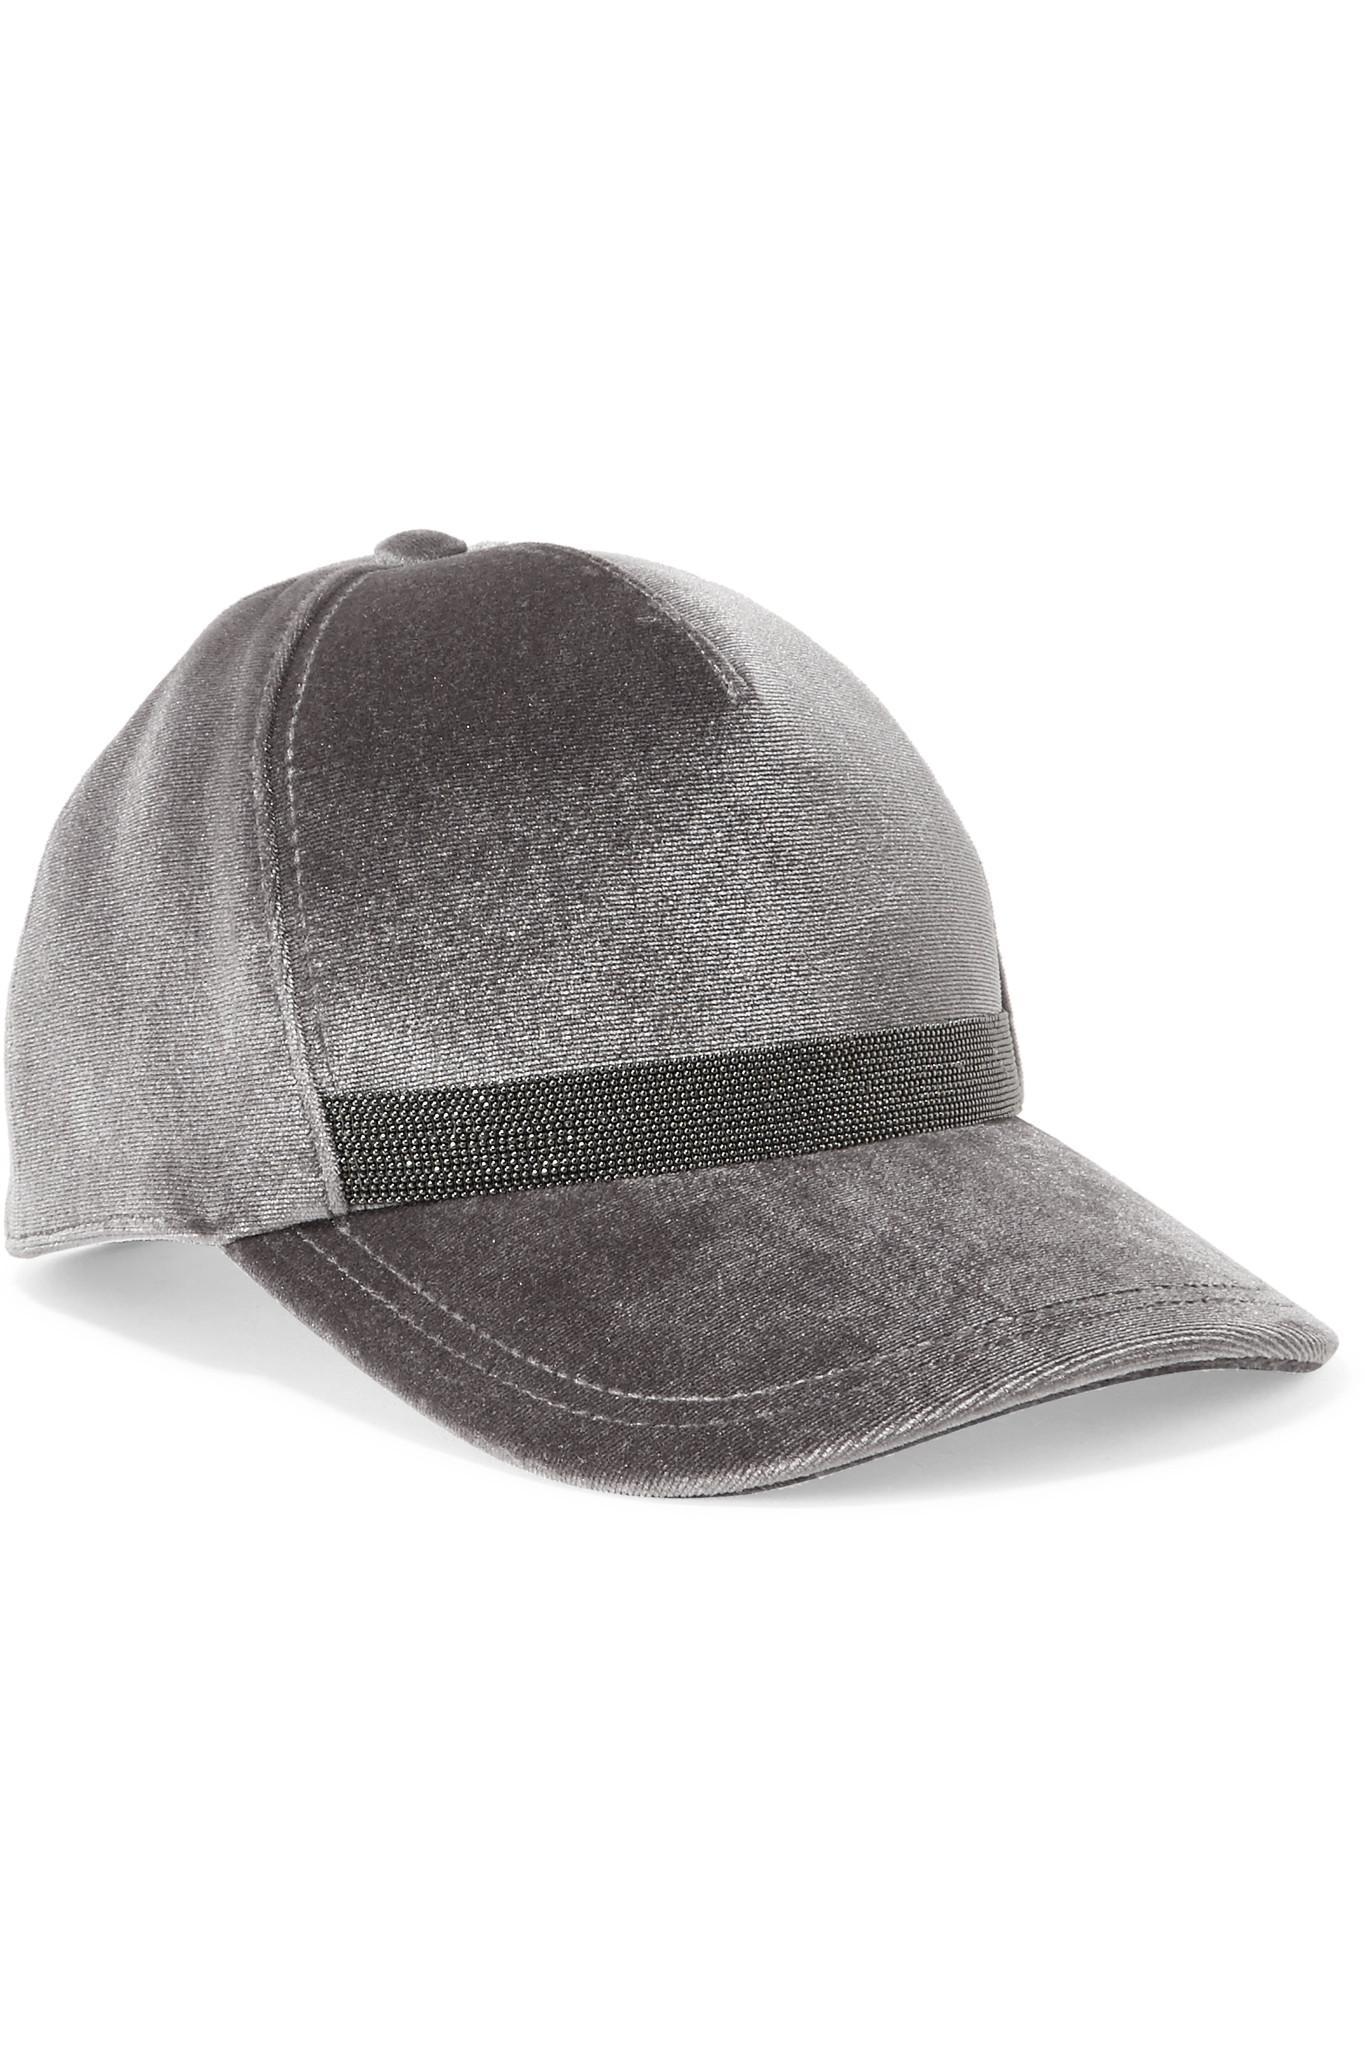 0dd806b604a Lyst - Brunello Cucinelli Beaded Velvet Baseball Cap in Metallic